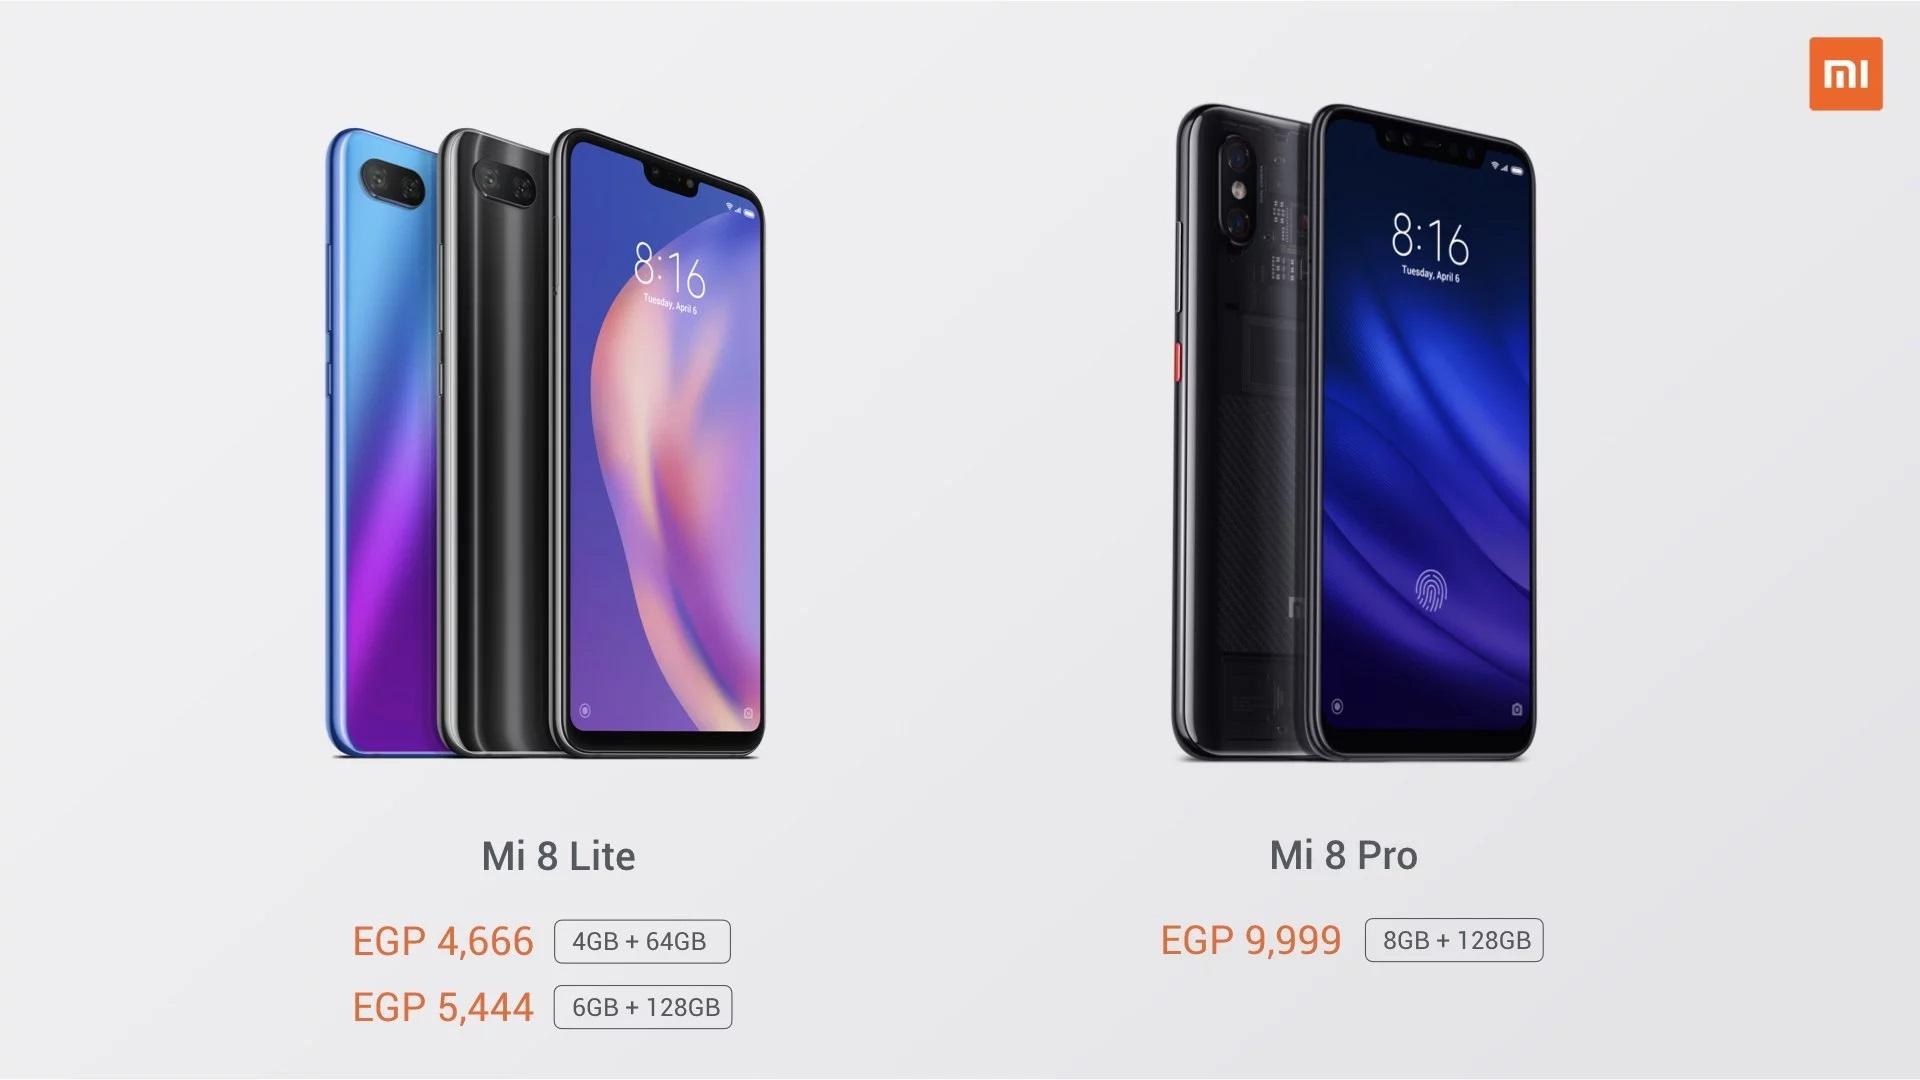 Mi Store in Egypt with Mi 8 Pro